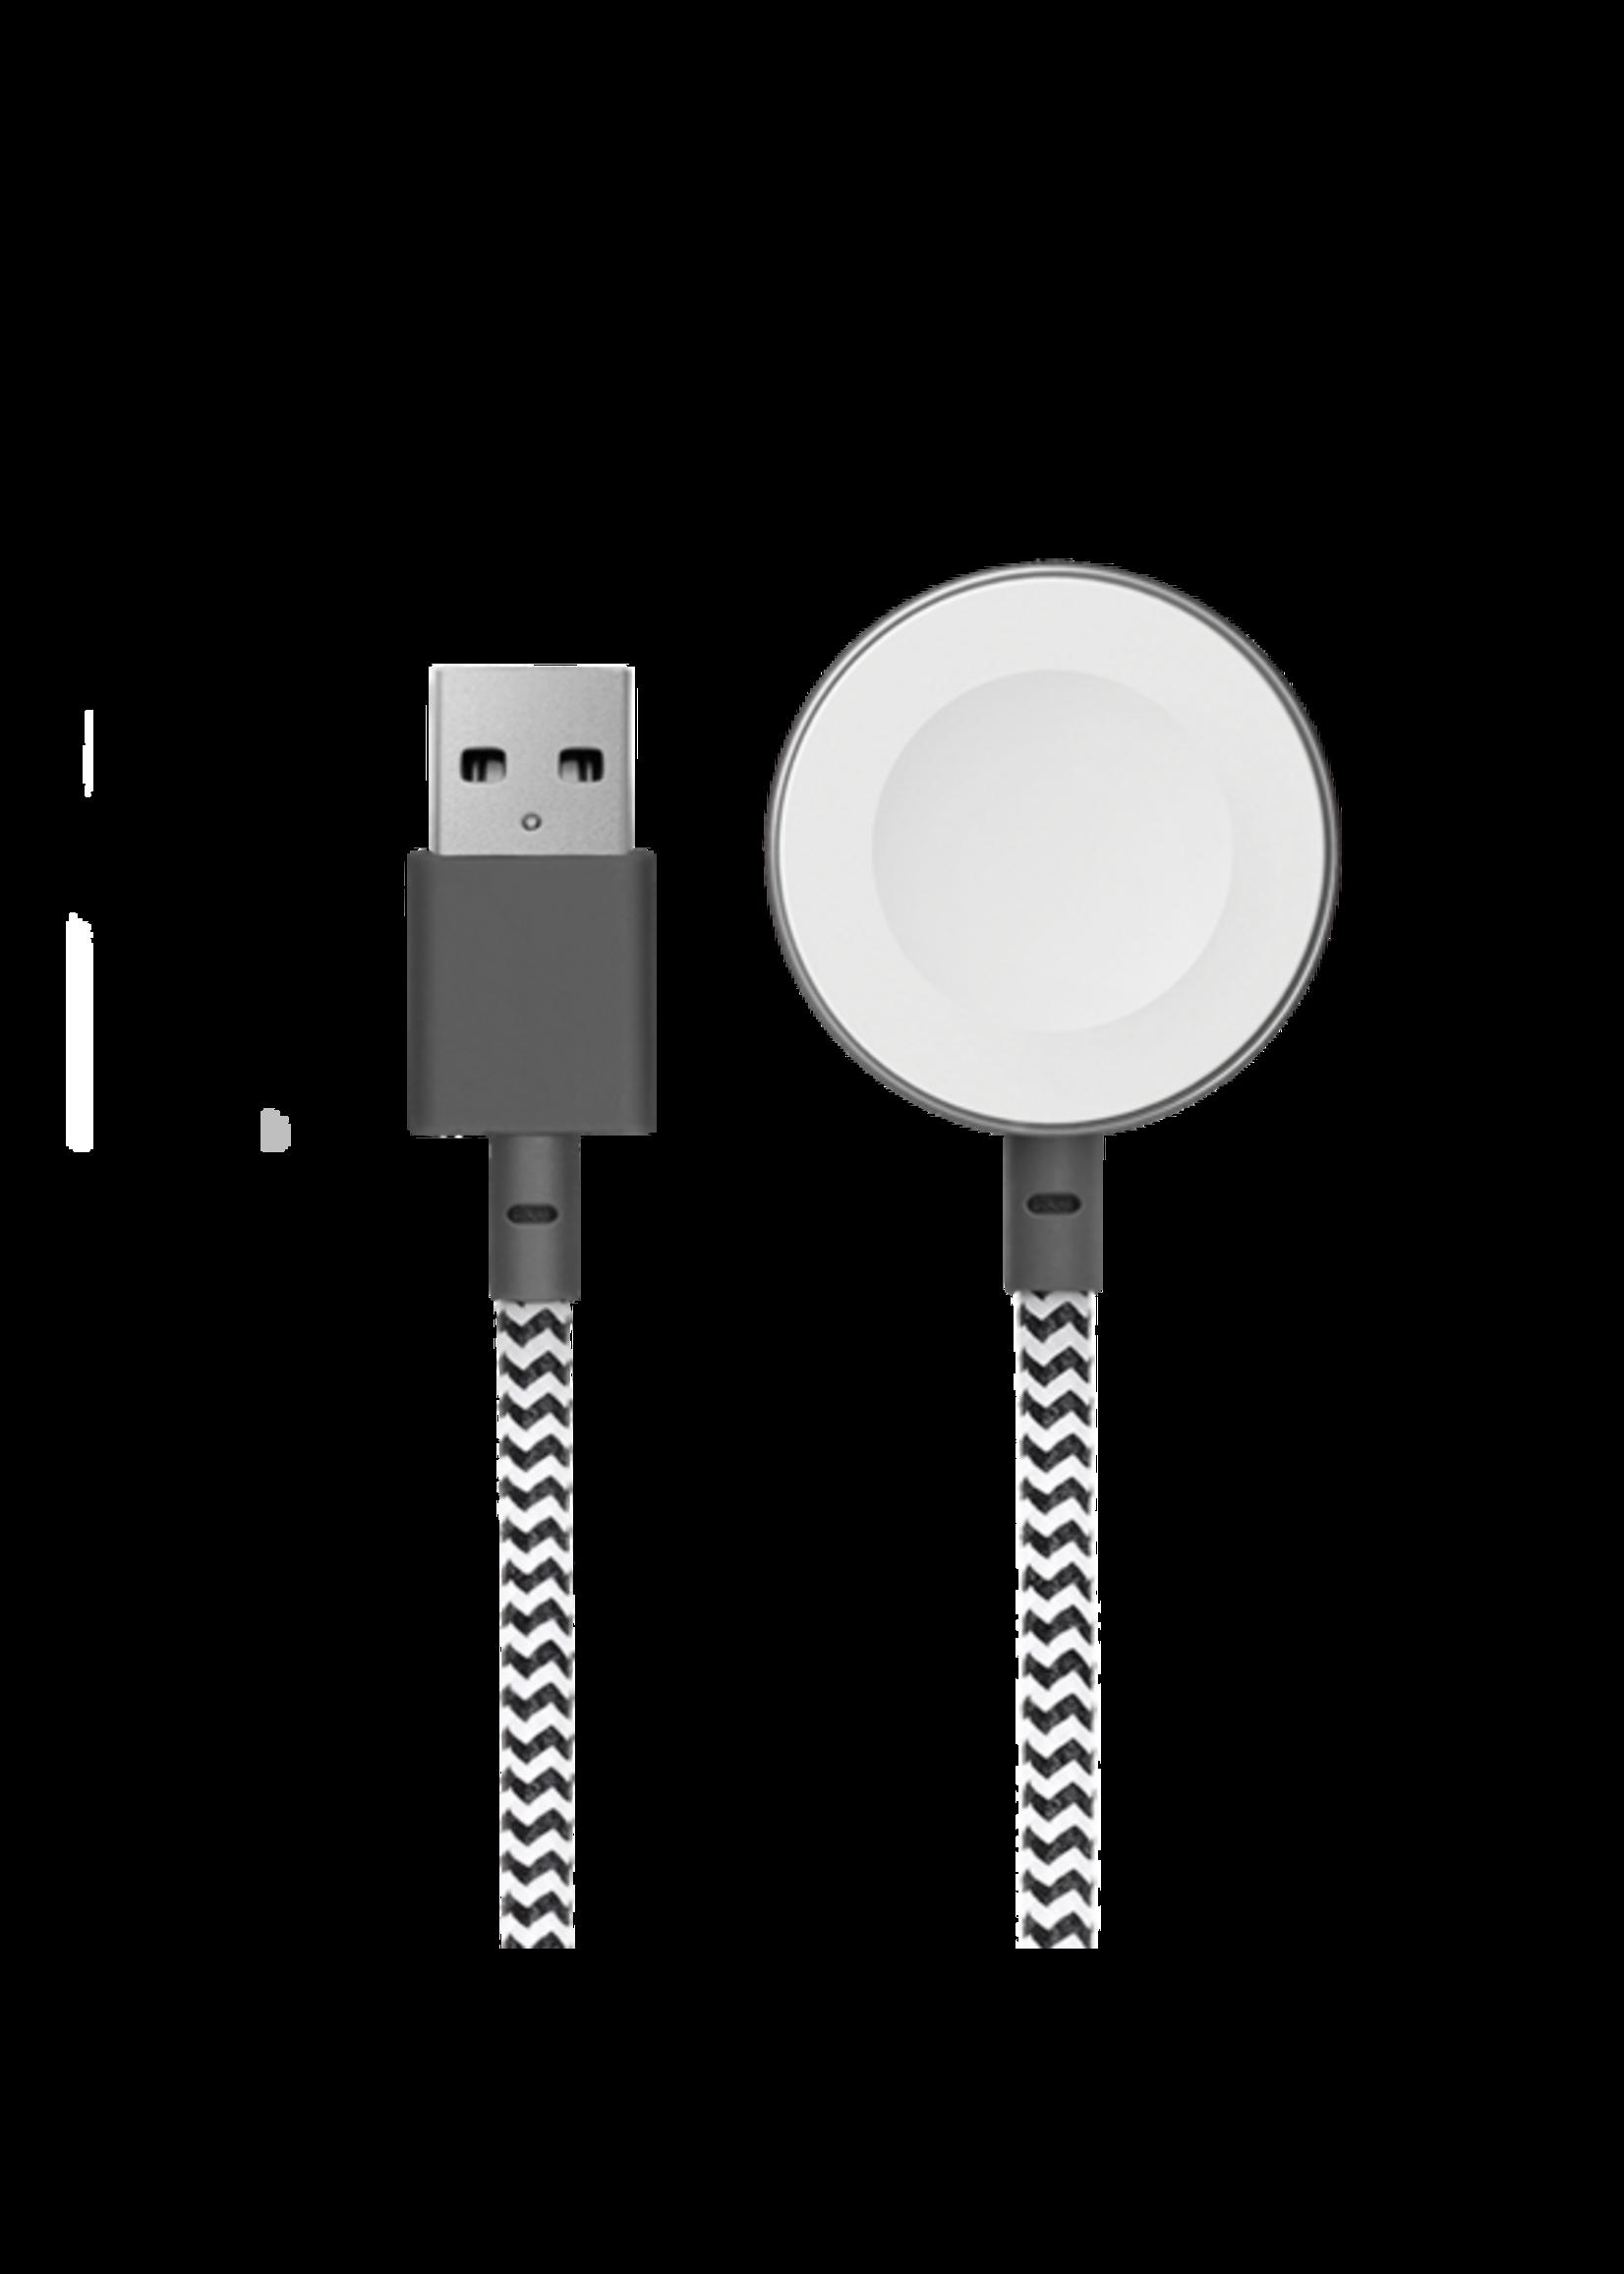 Native Union Native Union Belt Cable 1.2m - Apple Watch Charging Base - Zebra